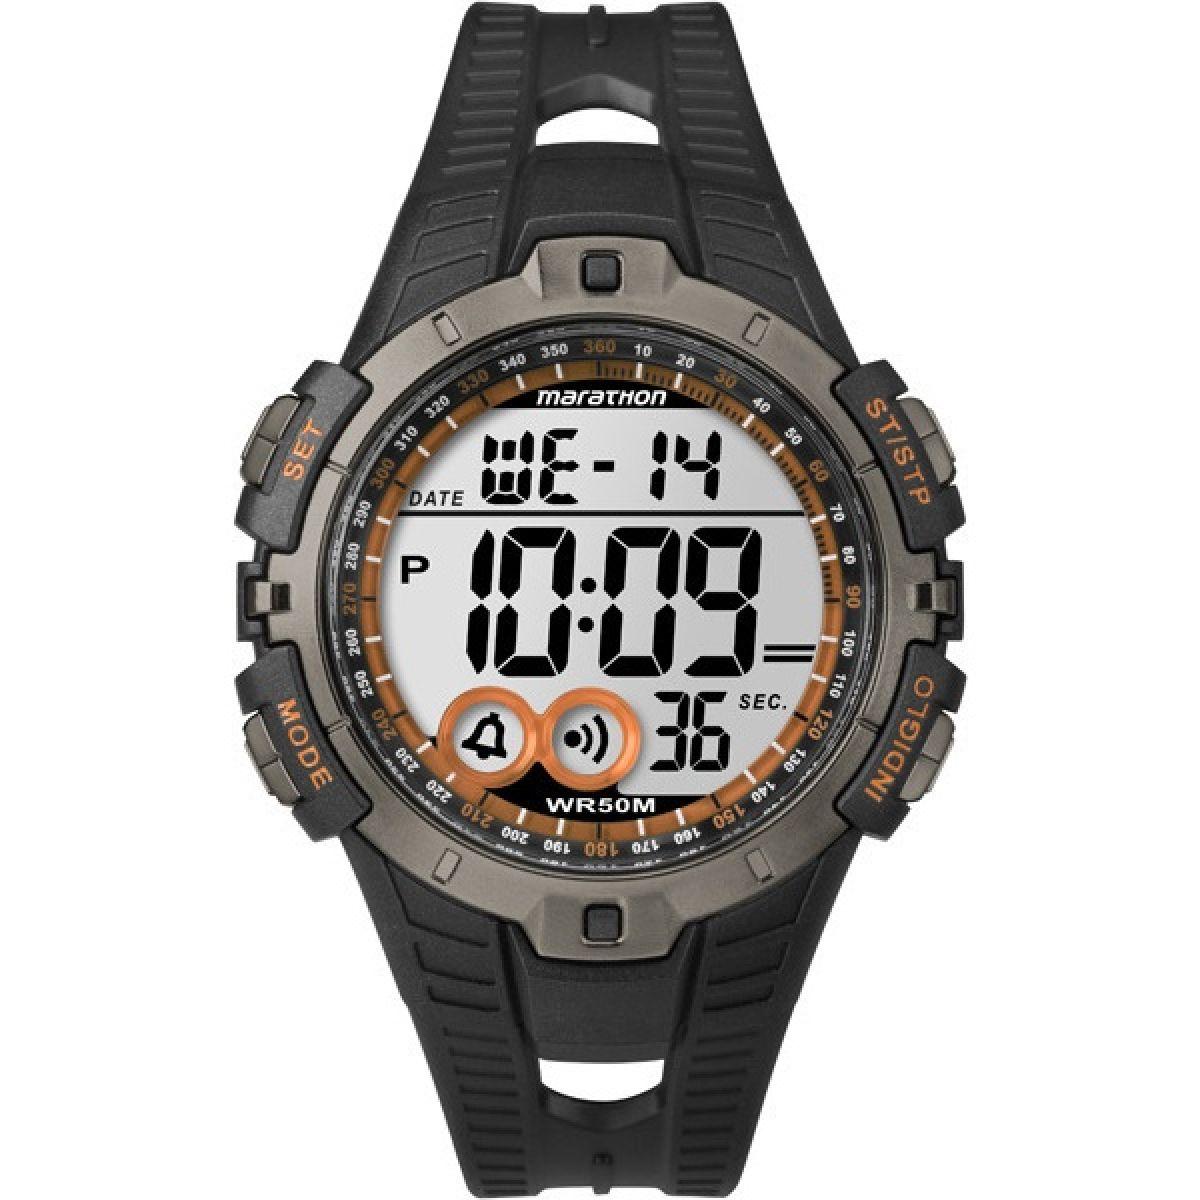 gents timex marathon alarm chronograph watch t5k801 watchshop com rh watchshop com manual timex marathon gps portugues Timex Marathon Watch